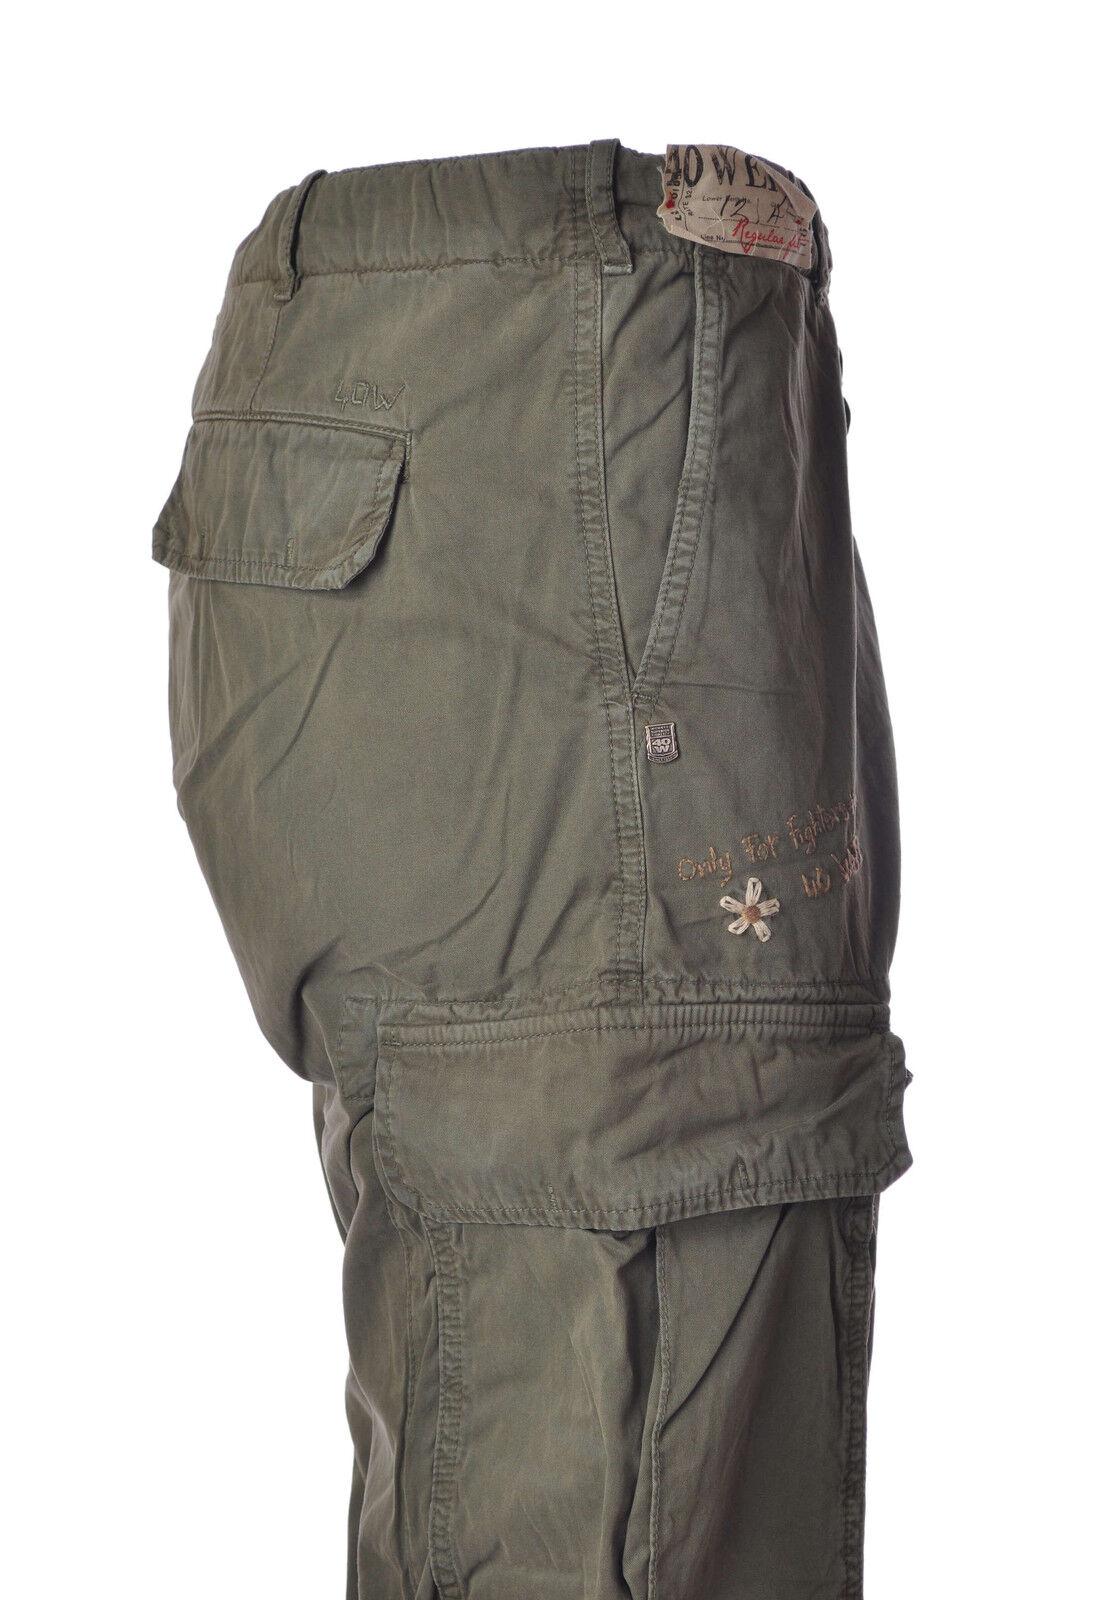 40 Weft  -  Pantaloni - men - green - 3544323A180325